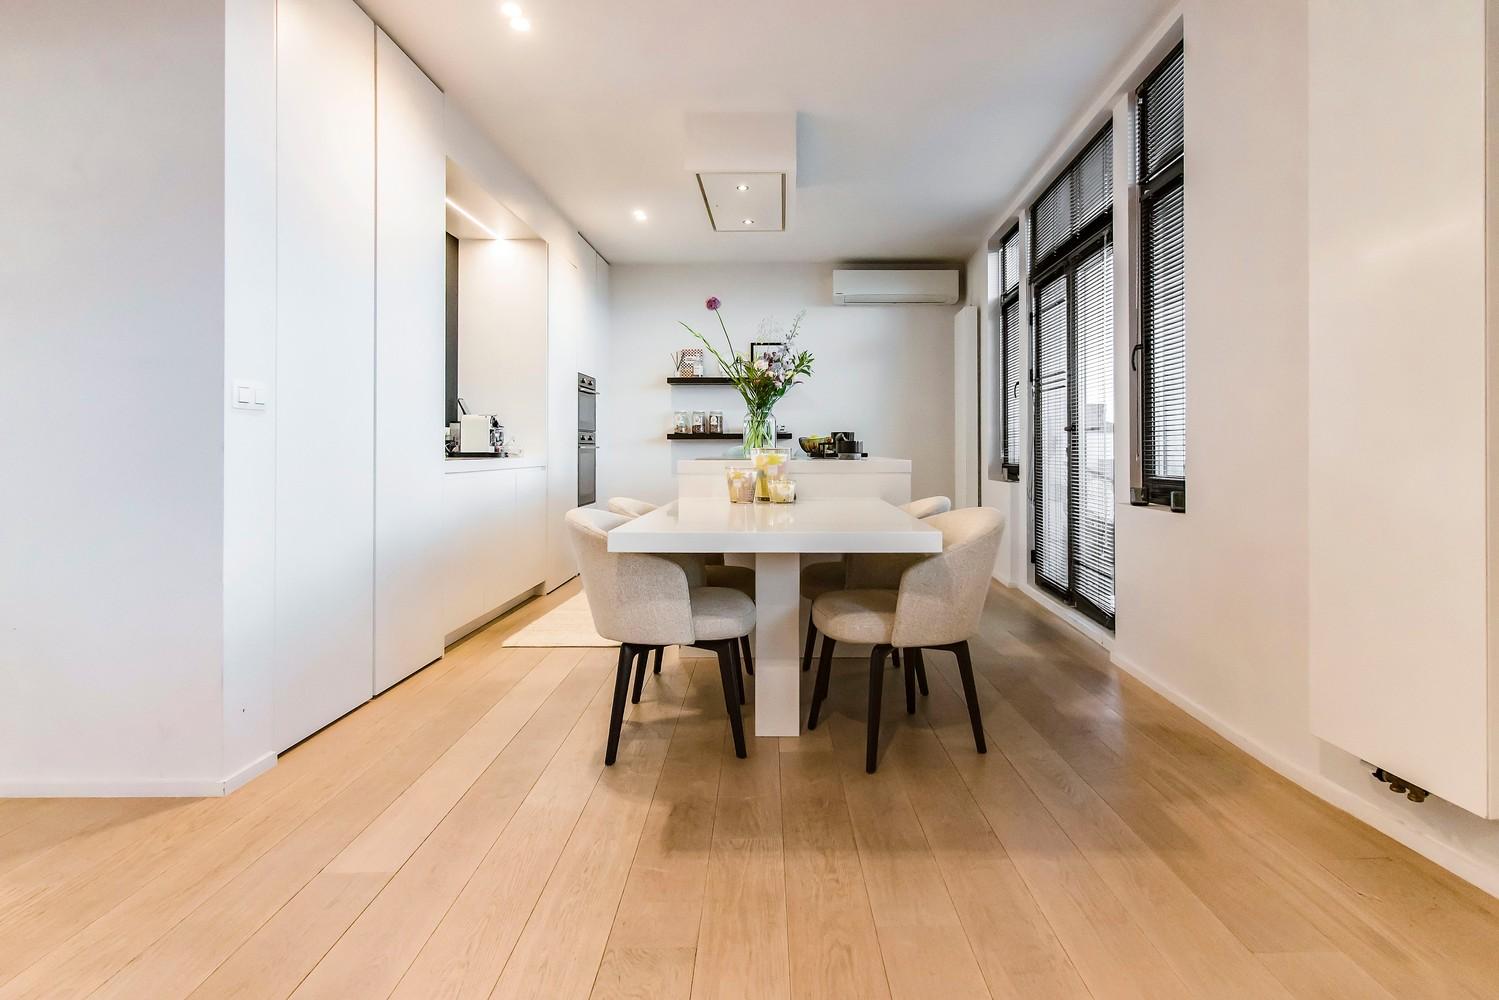 Luxueus gerenoveerde penthouse (230 m²) op uitstekende ligging te Antwerpen! afbeelding 1